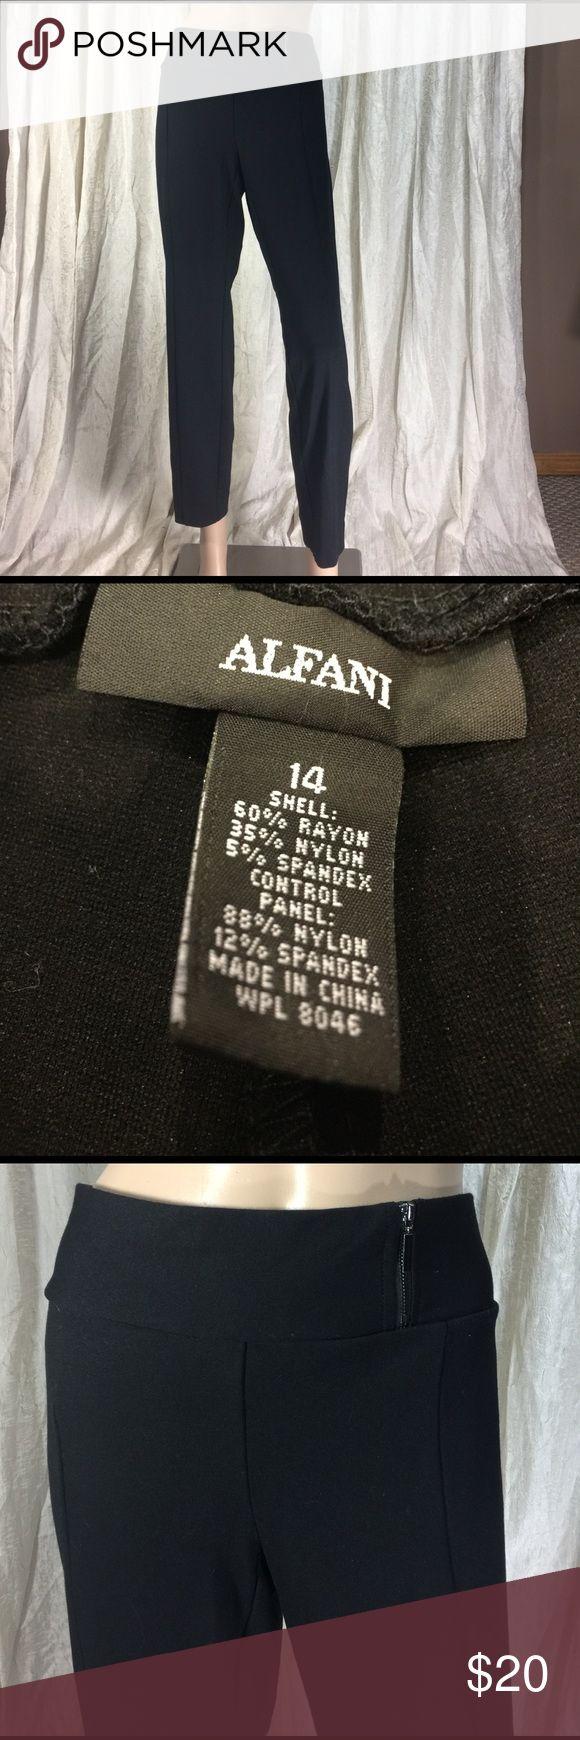 "BLACK ankle pants size 14 crop dress pants Black ankle pants, crop dress pants made by Alfani size 14 waist 38"" hips 44"" length 27.5"" Stretchy material Alfani Pants Ankle & Cropped"